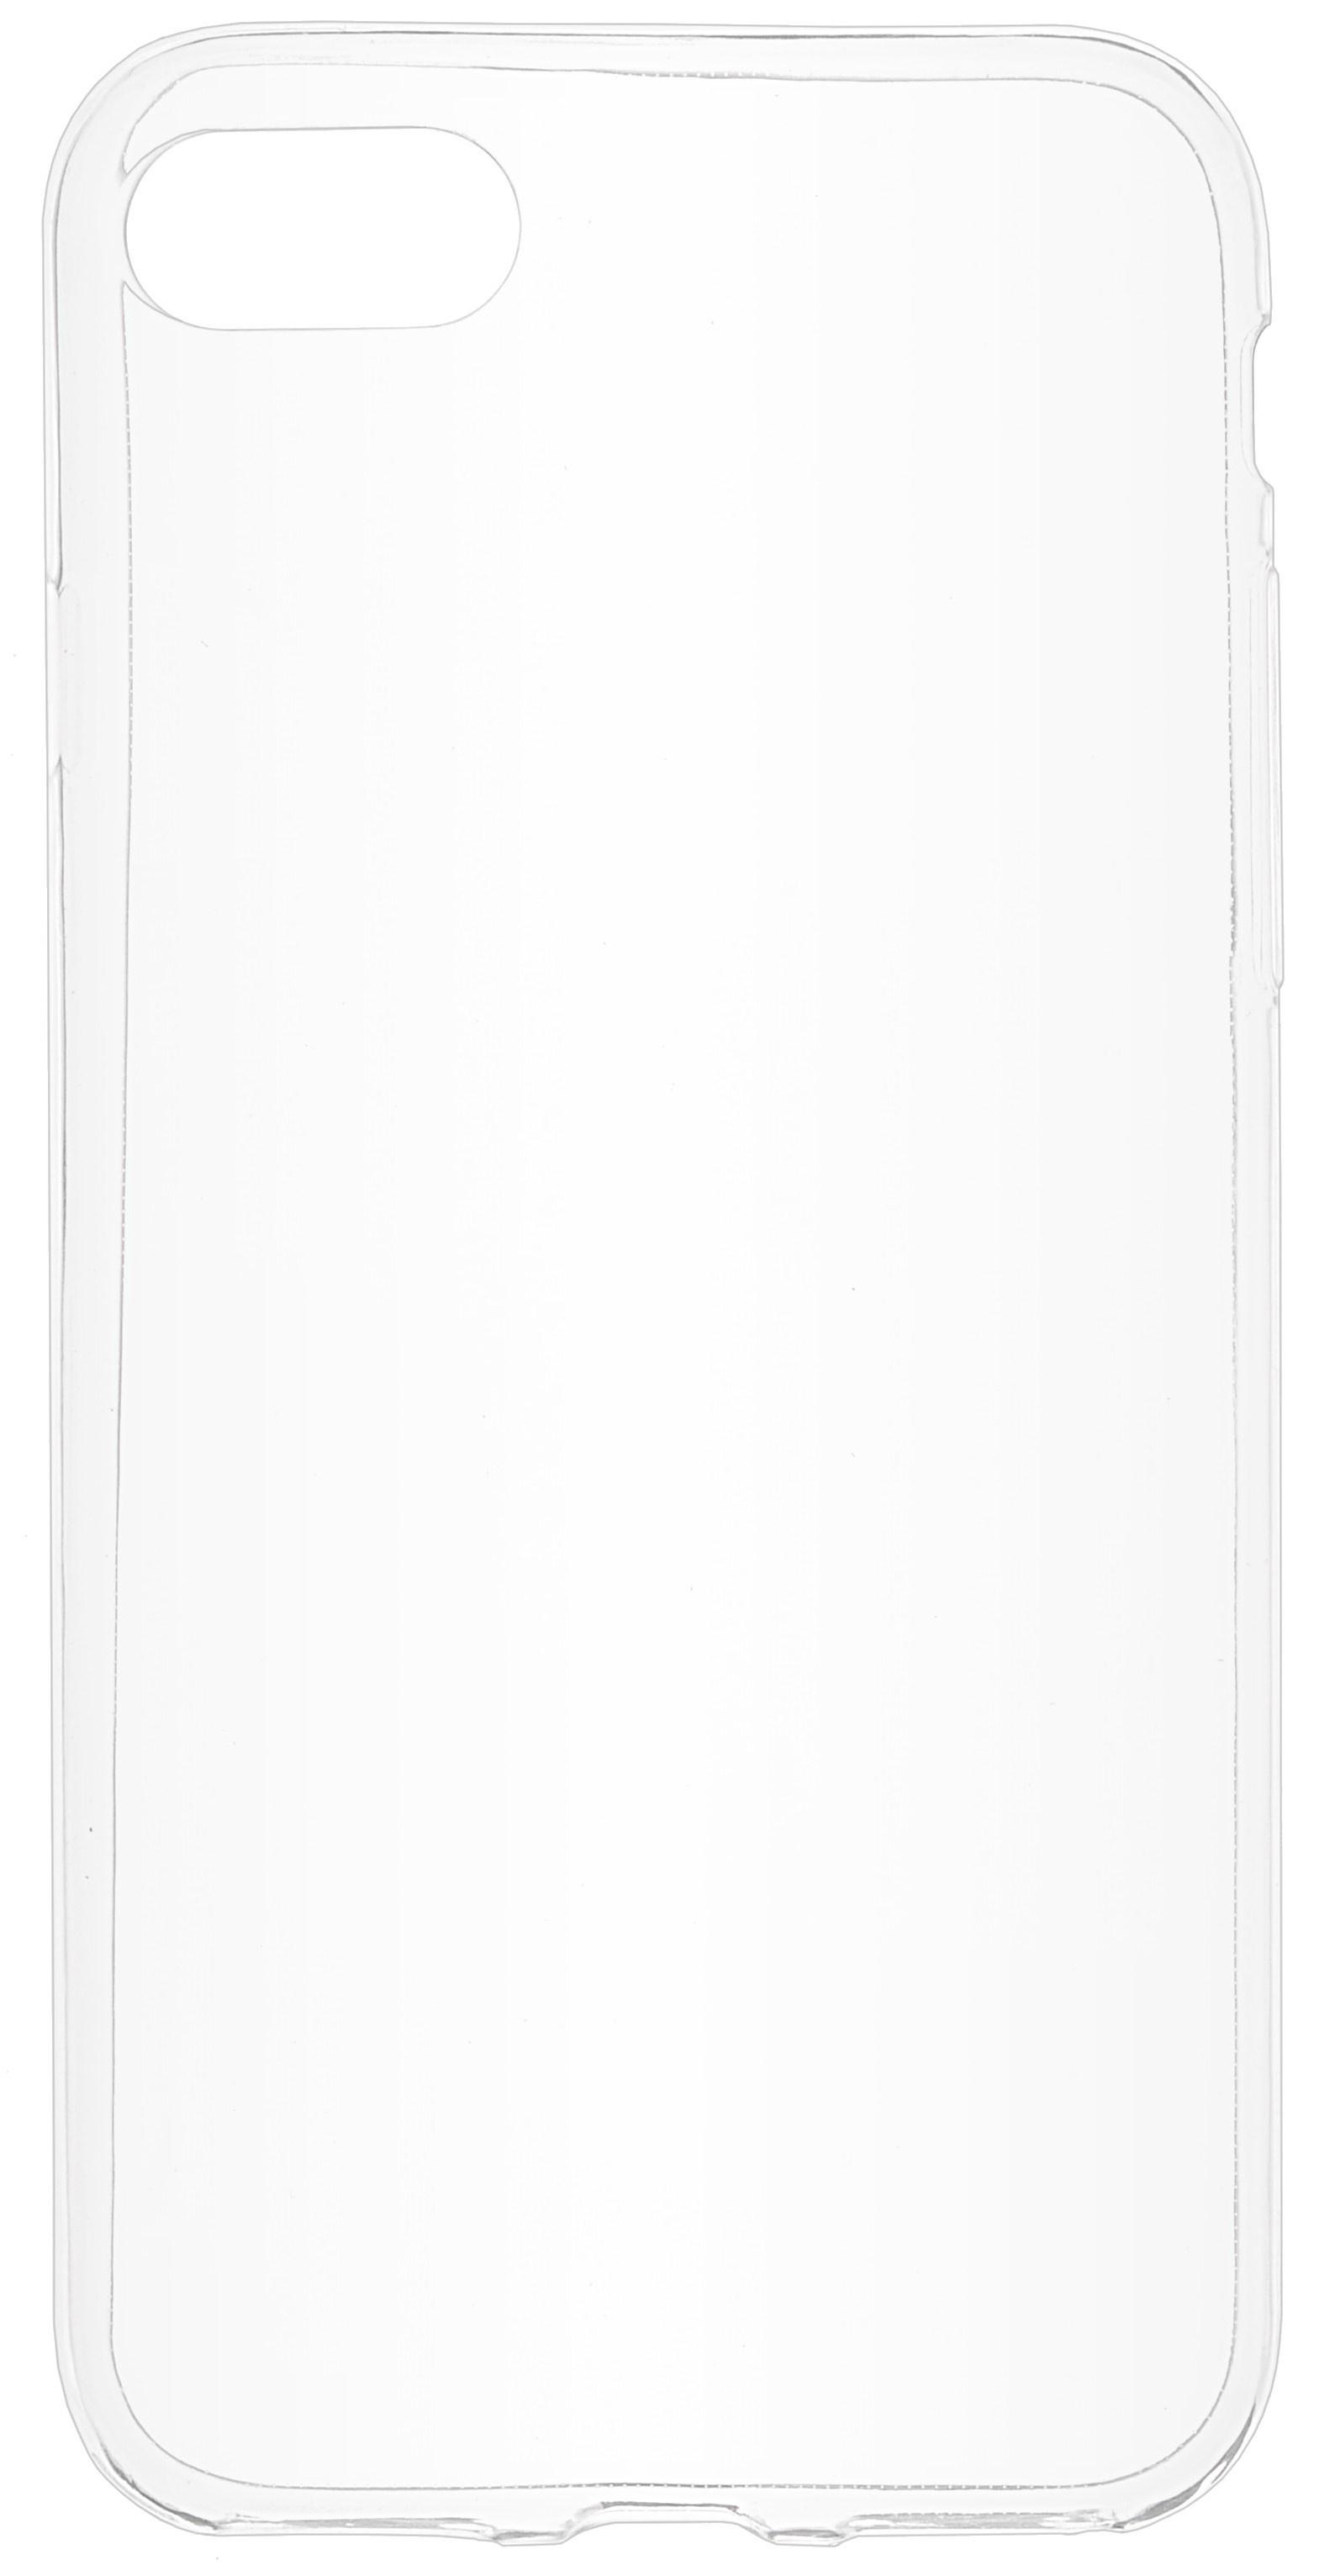 Чехол для сотового телефона skinBOX Slim Silicone, 4660041407792, прозрачный цена и фото